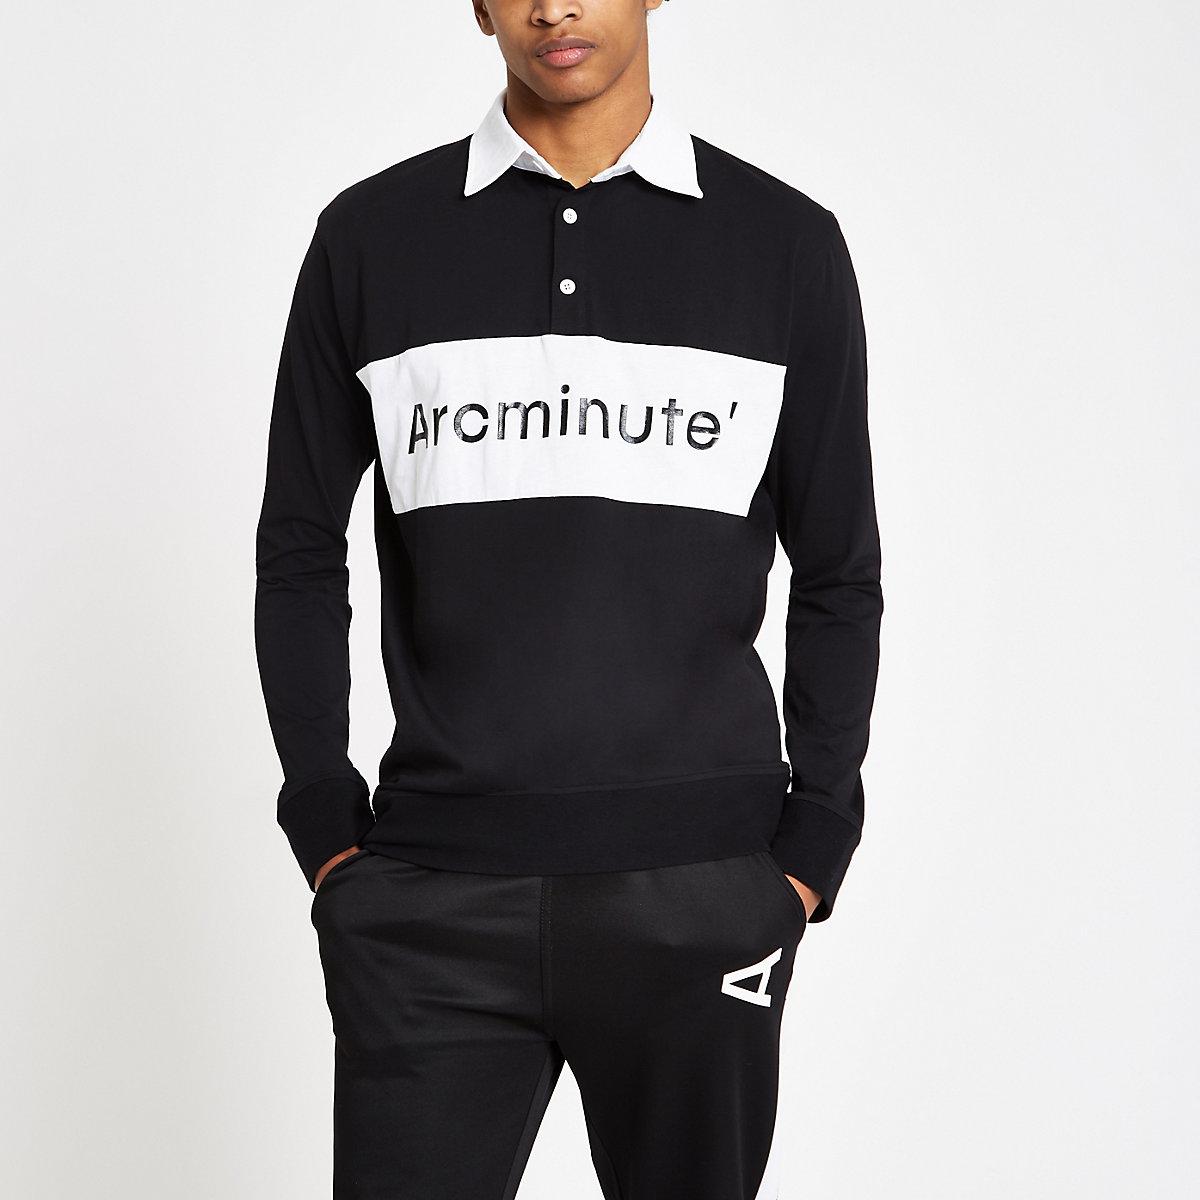 Arcminute – Schwarzes, langärmliges Rugby-Hemd